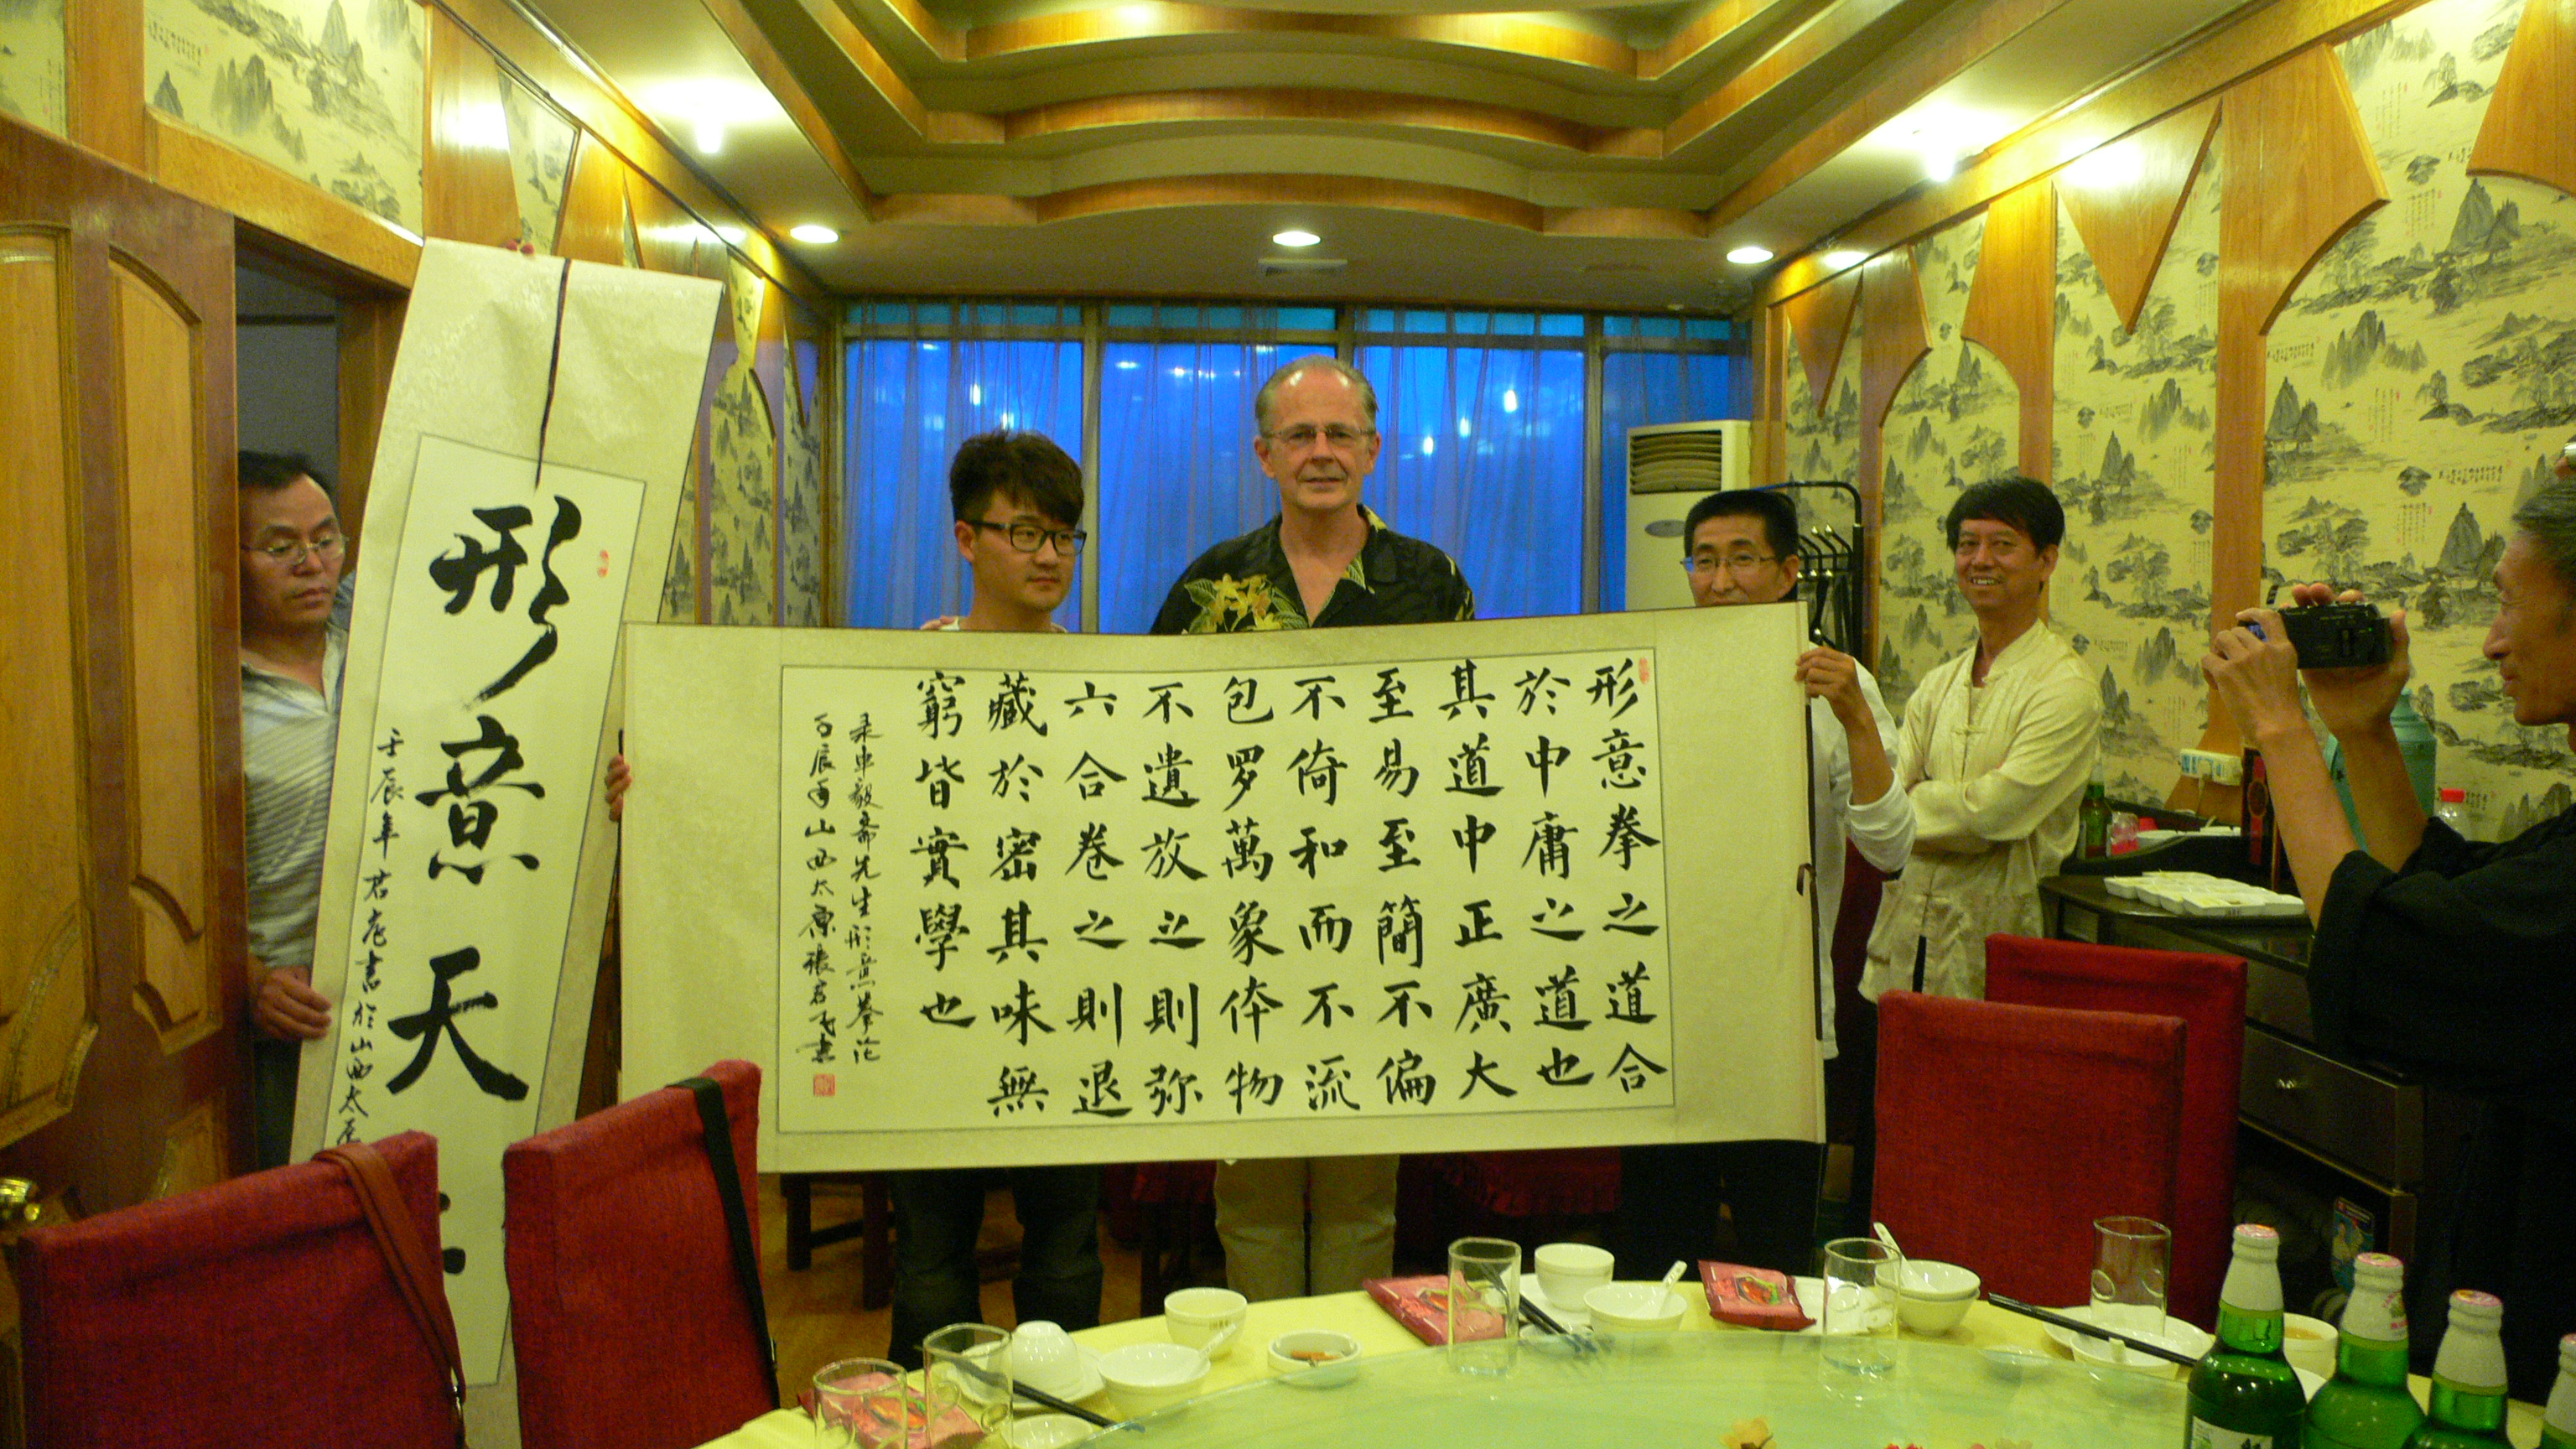 Final night in Taiyuan